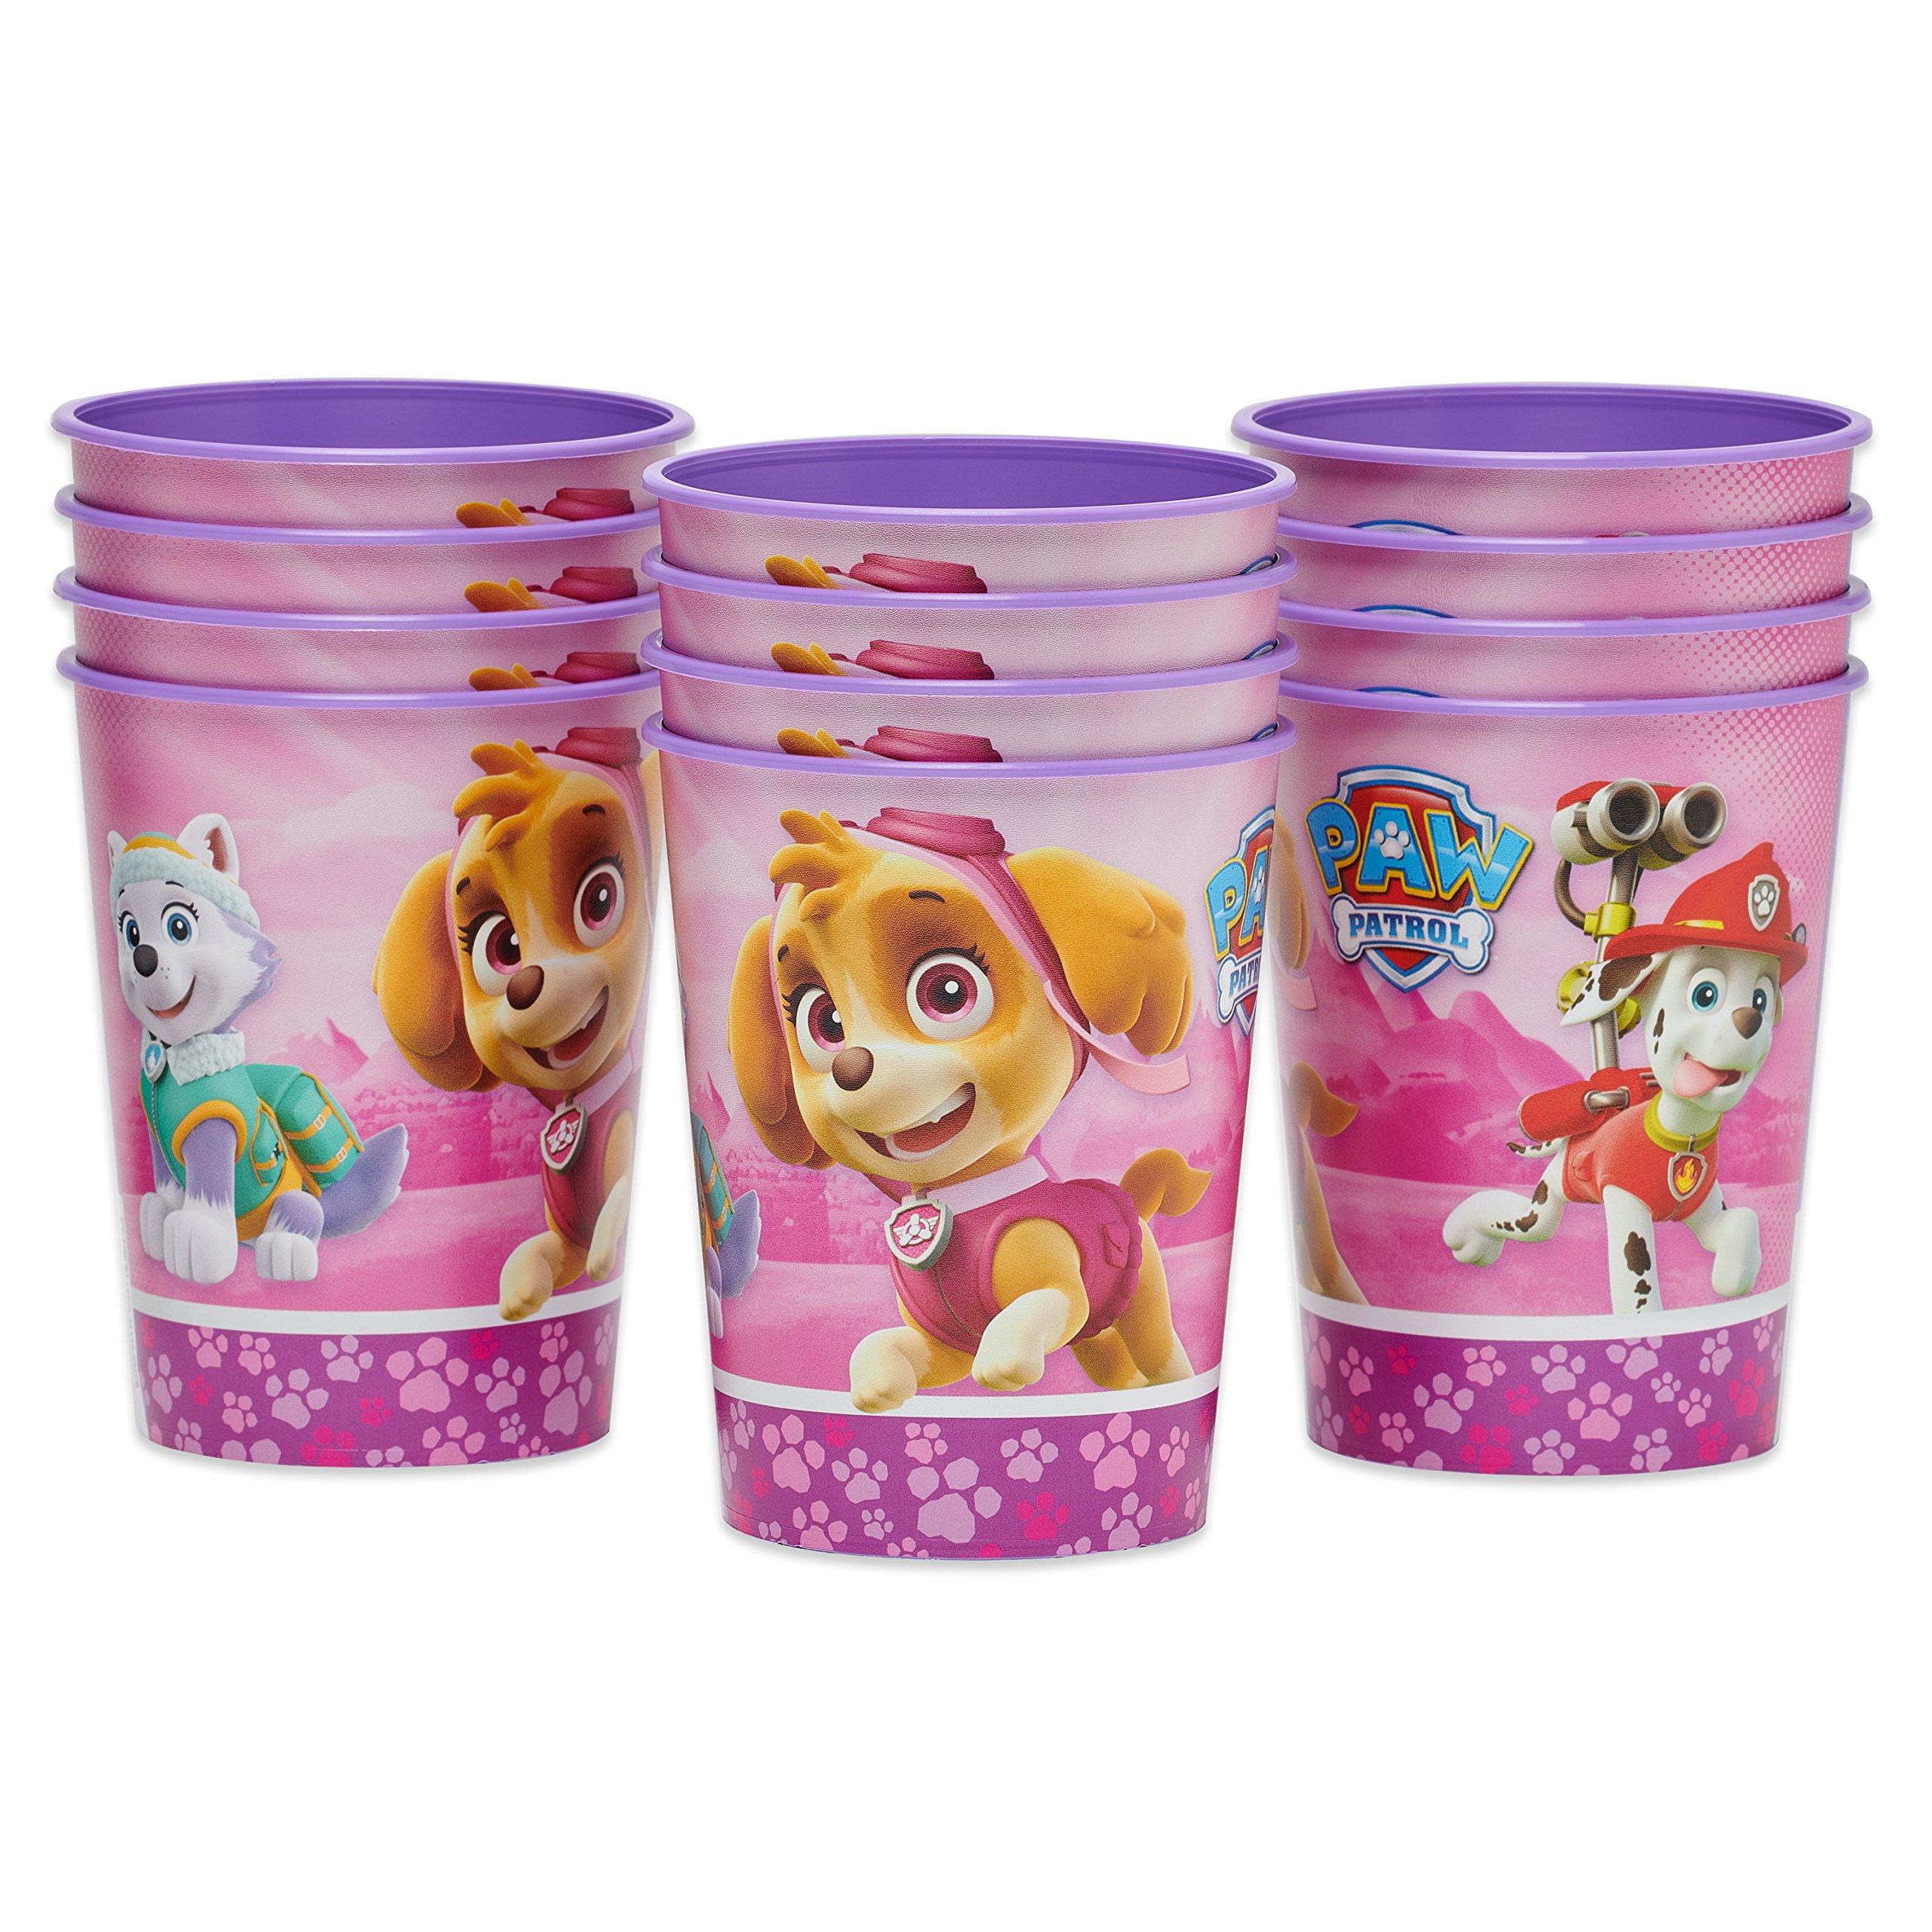 Nickelodeon Paw Patrol Pink Plastic Cups Paper, 12-Count, Stadium by Nickelodeon